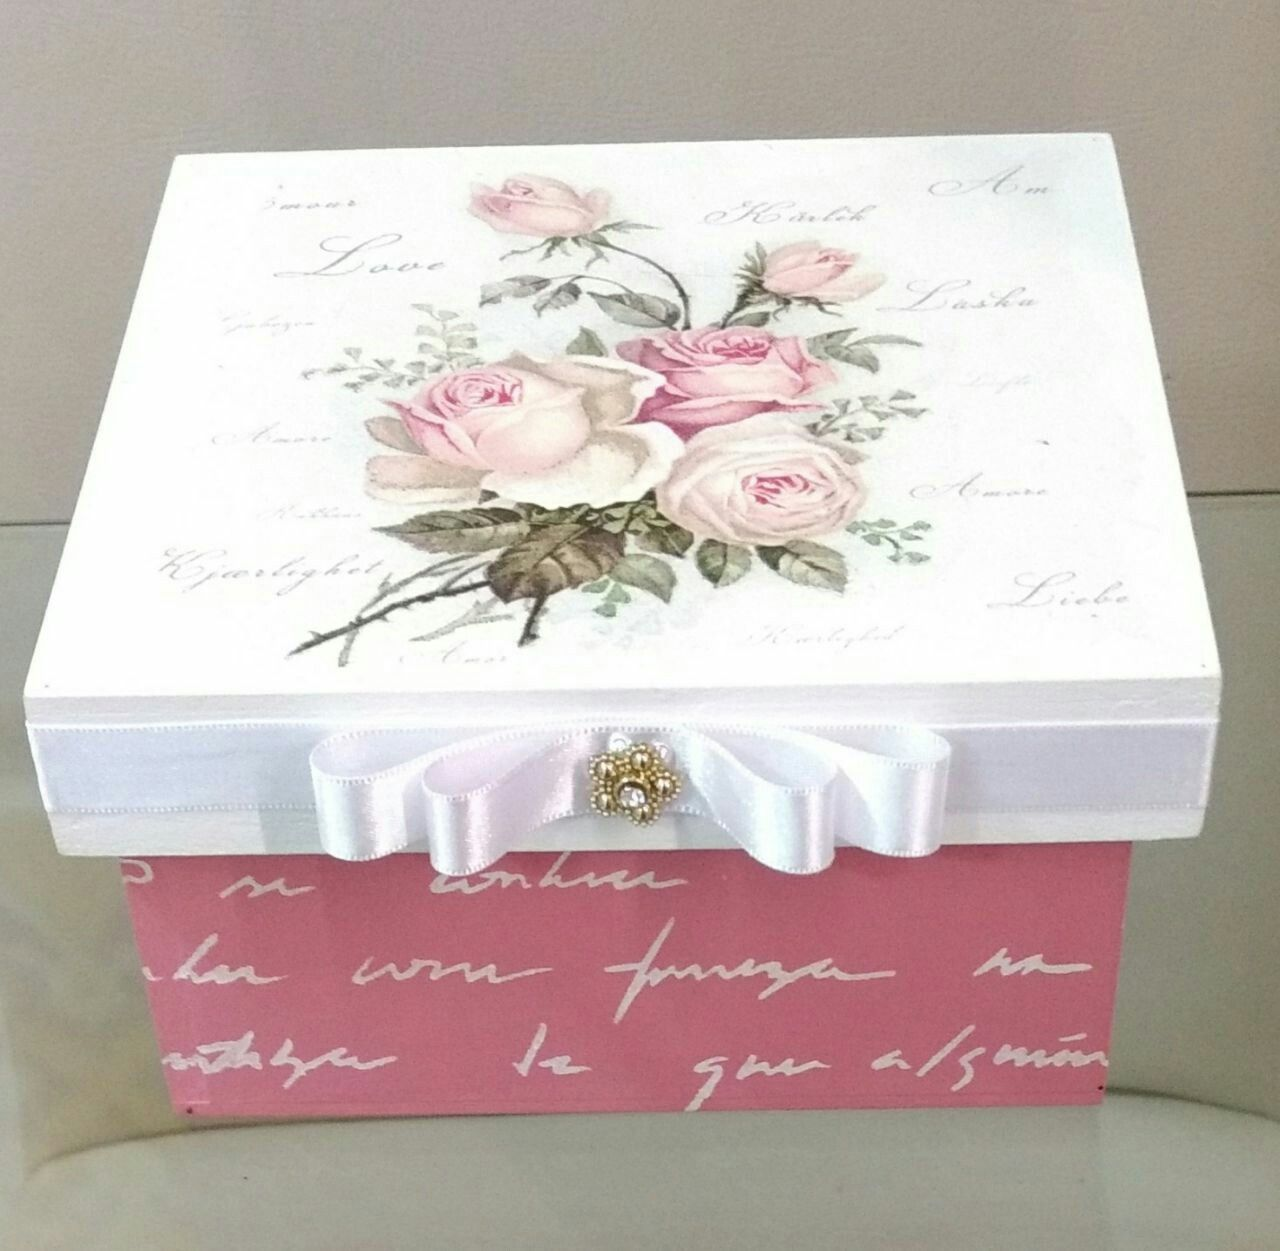 Caixa rosa #caixasdemadeira Caixa rosa #caixasdemadeira Caixa rosa #caixasdemadeira Caixa rosa #caixasdemadeira